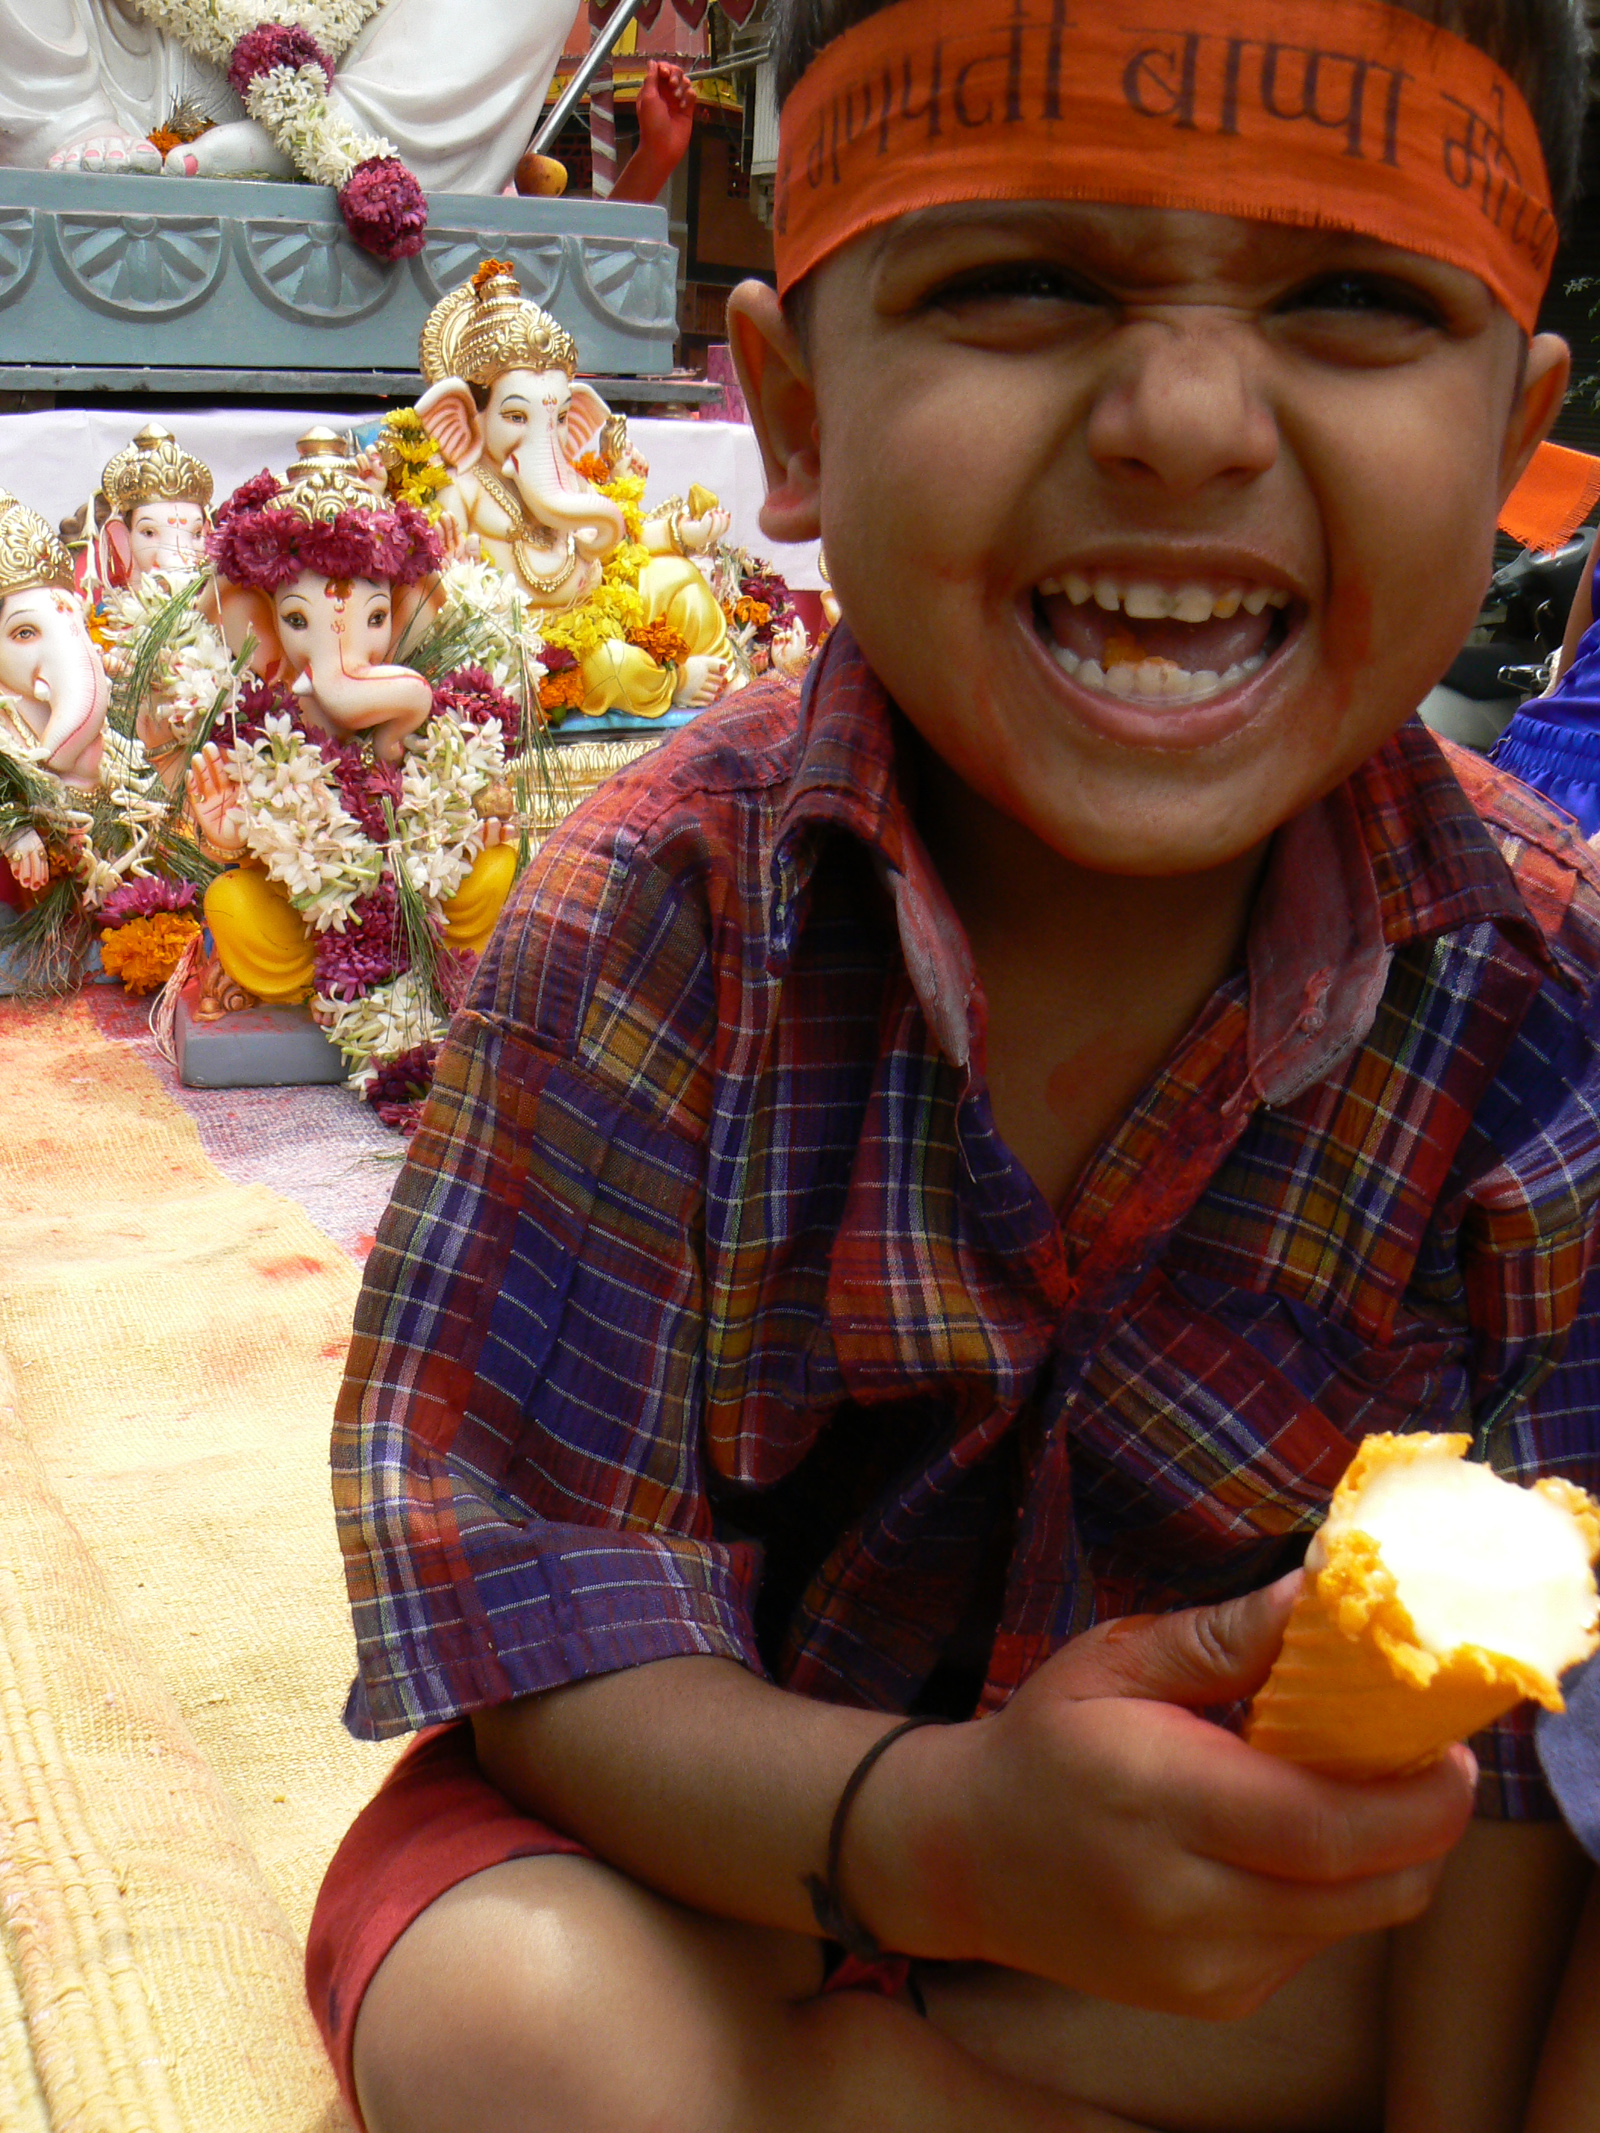 Joys of small things, Boy, Bspo06, Child, Festival, HQ Photo